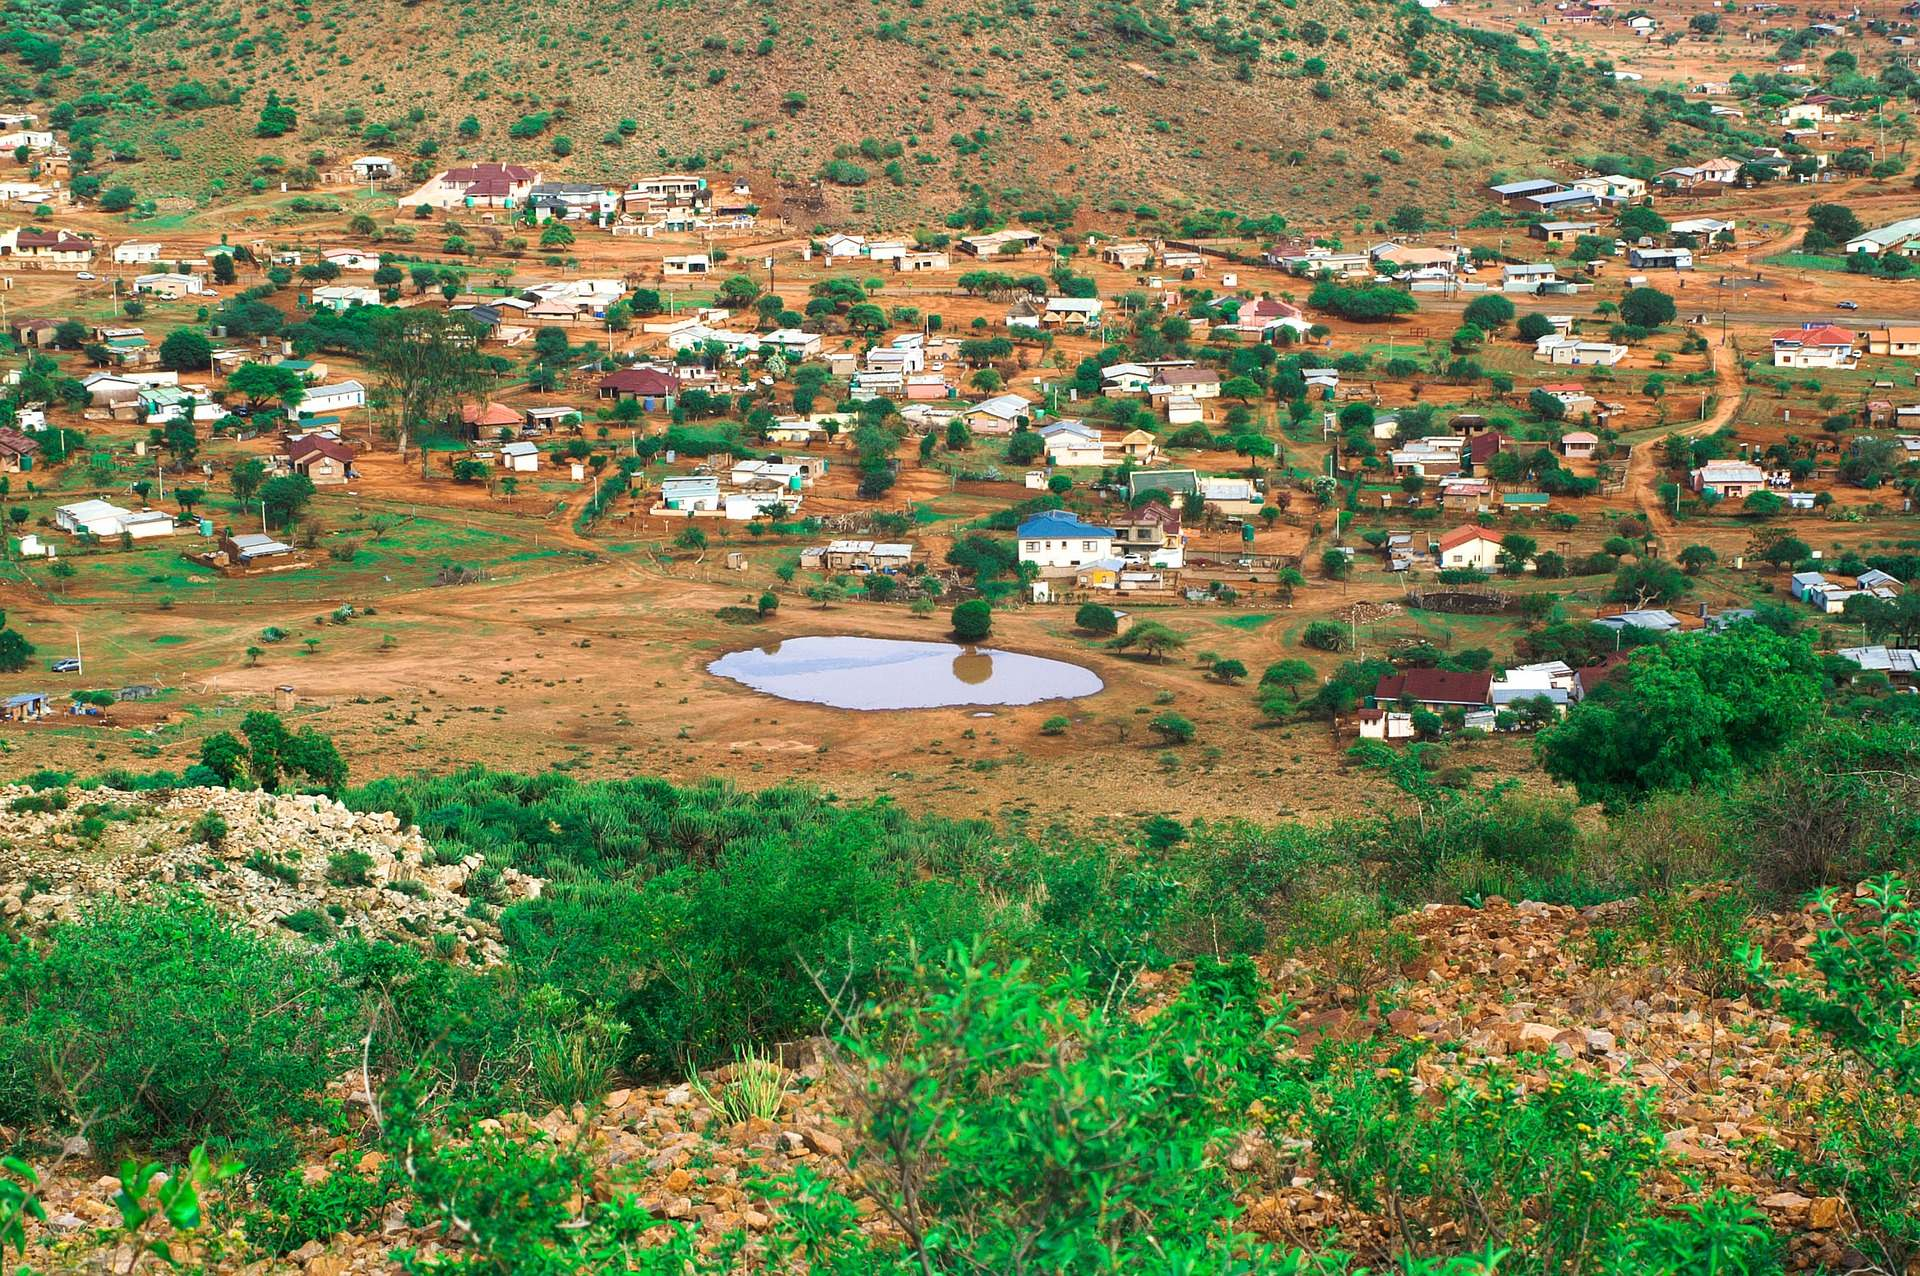 Limpopo Village. Image by Steward Masweneng from Pixabay